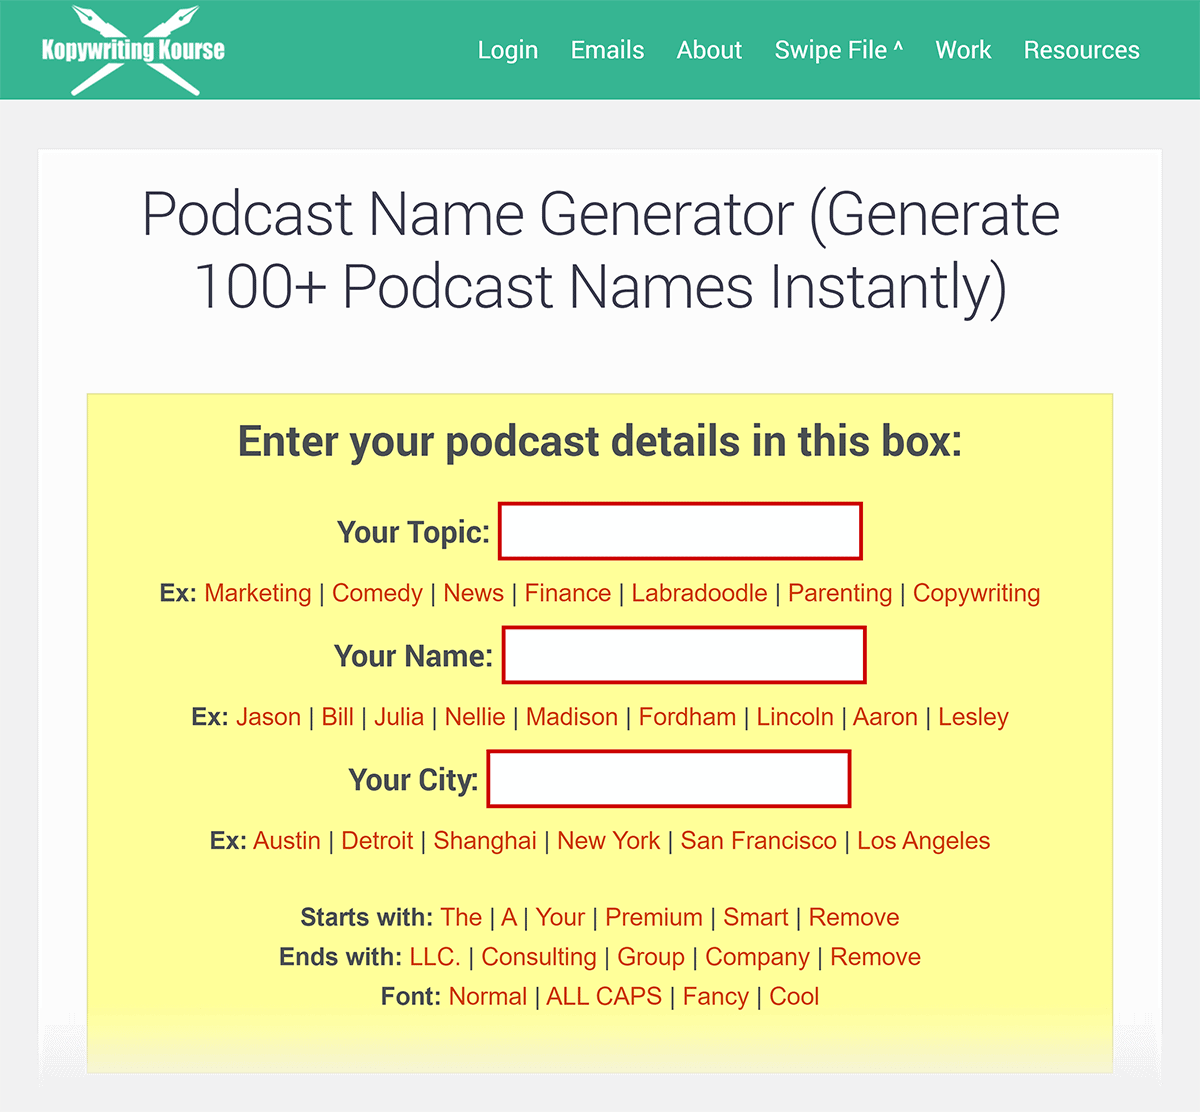 Podcast name generator tool